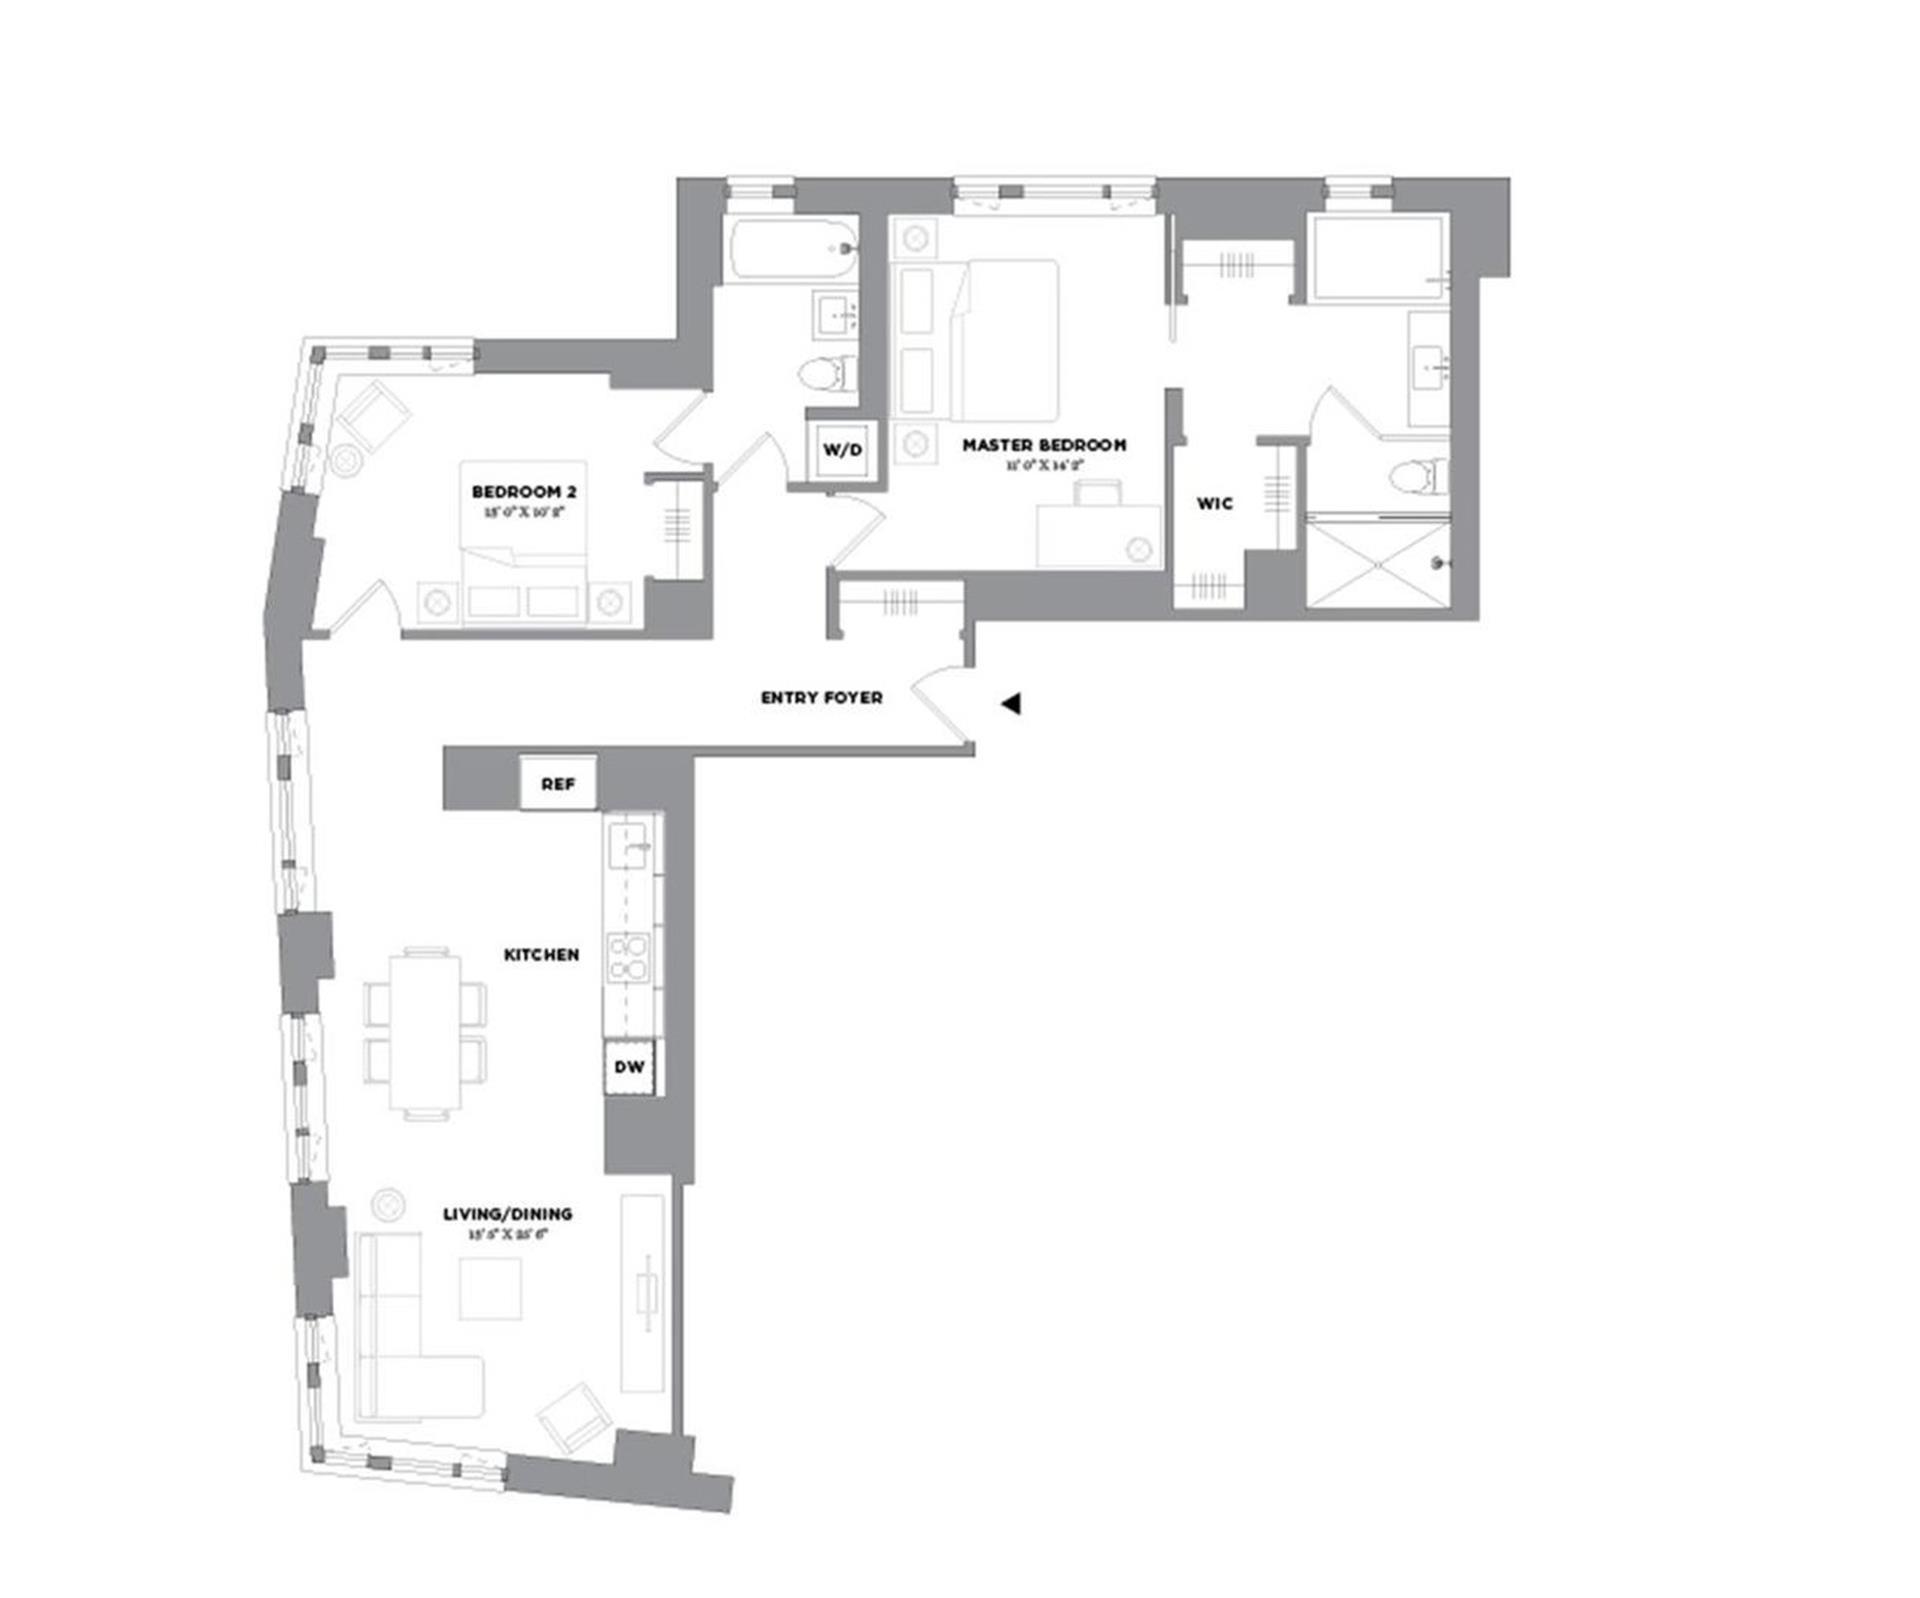 Floor plan of 15 William, 15 William Street, 30A - Financial District, New York